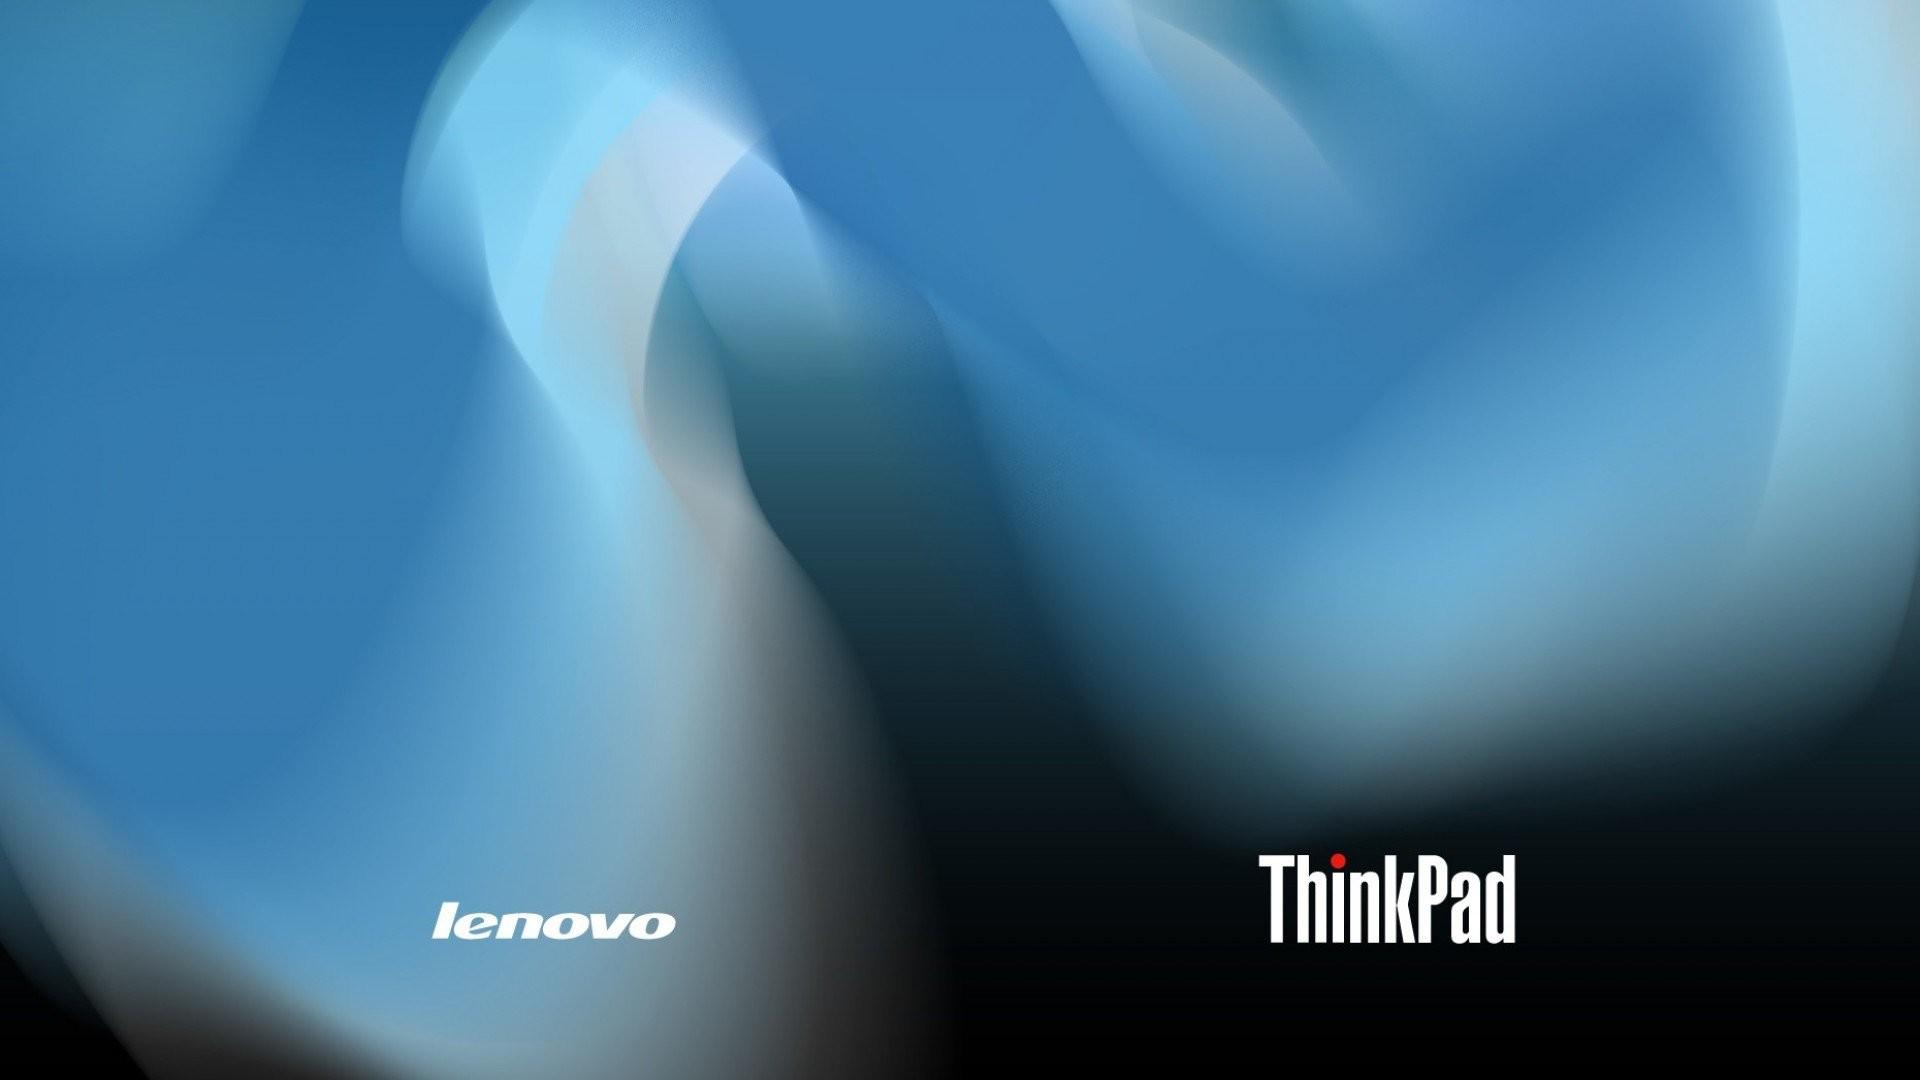 Lenovo Thinkpad Wallpaper (67+ Images